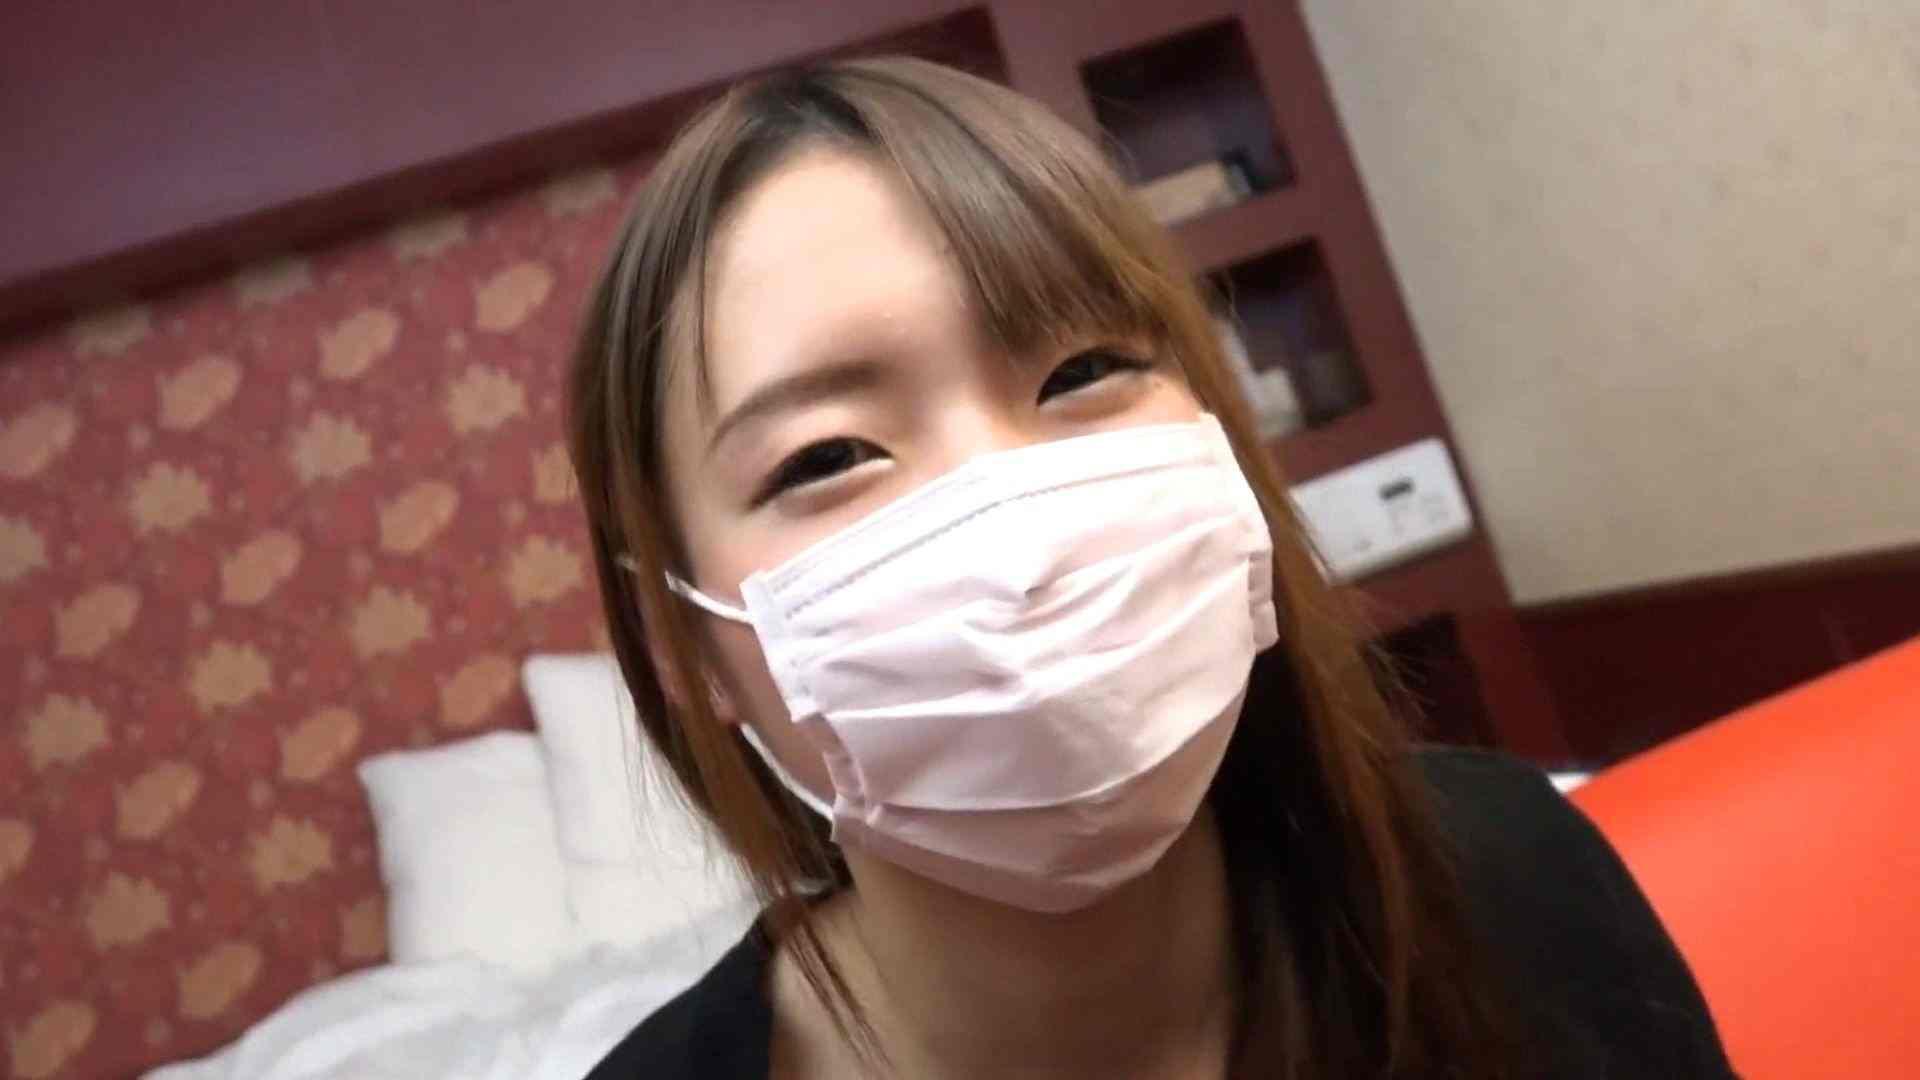 S級厳選美女ビッチガールVol.40 前編 美女  86pic 4